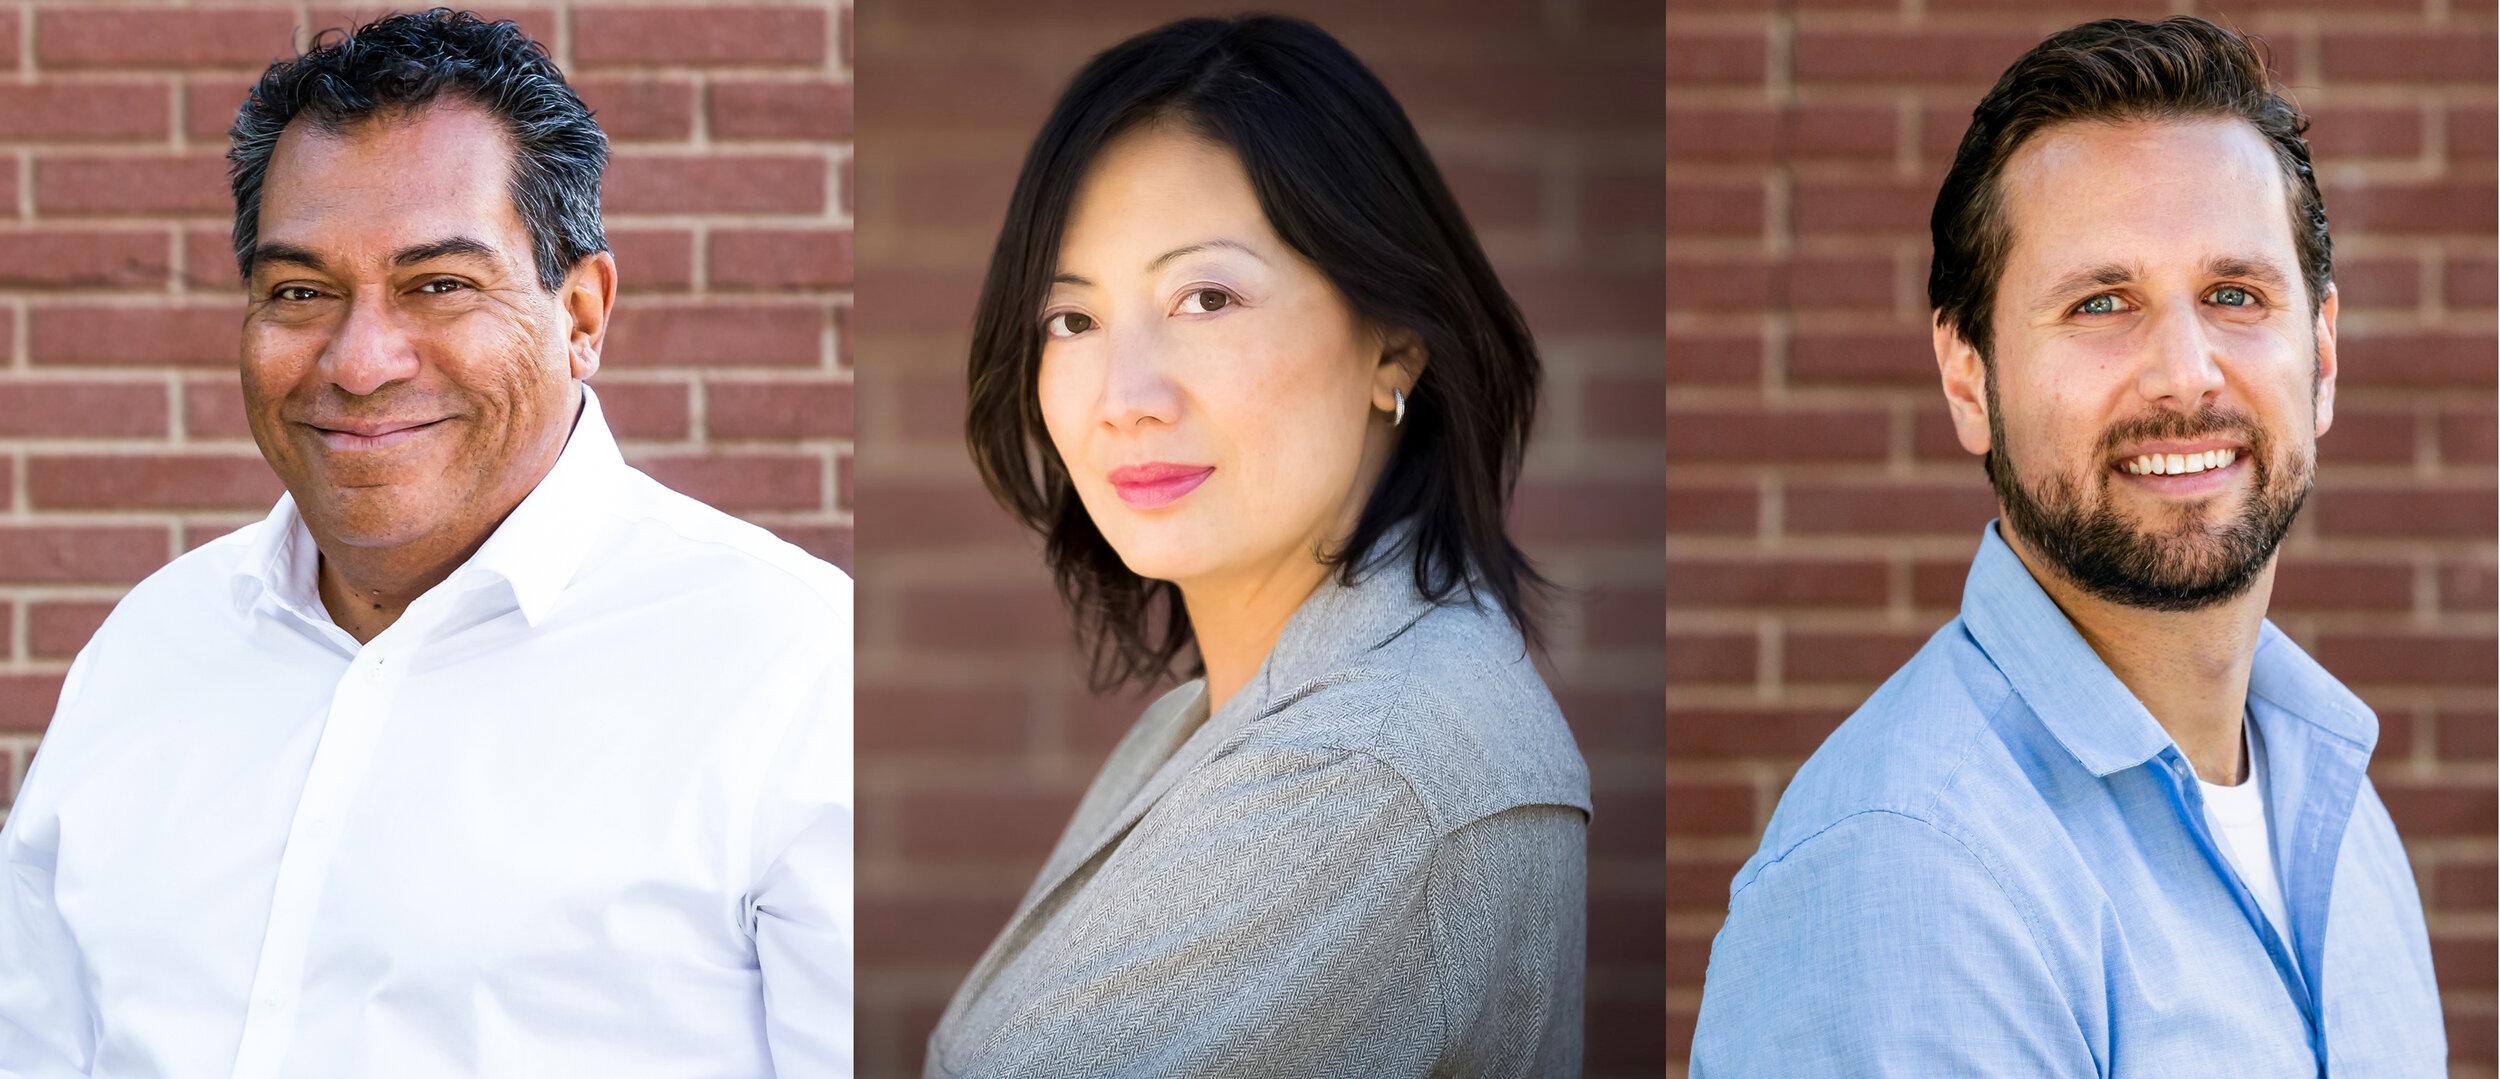 VLDG Team - Paul Vega . raVennie Lau . LEED APPeter Fritzky . BA INT